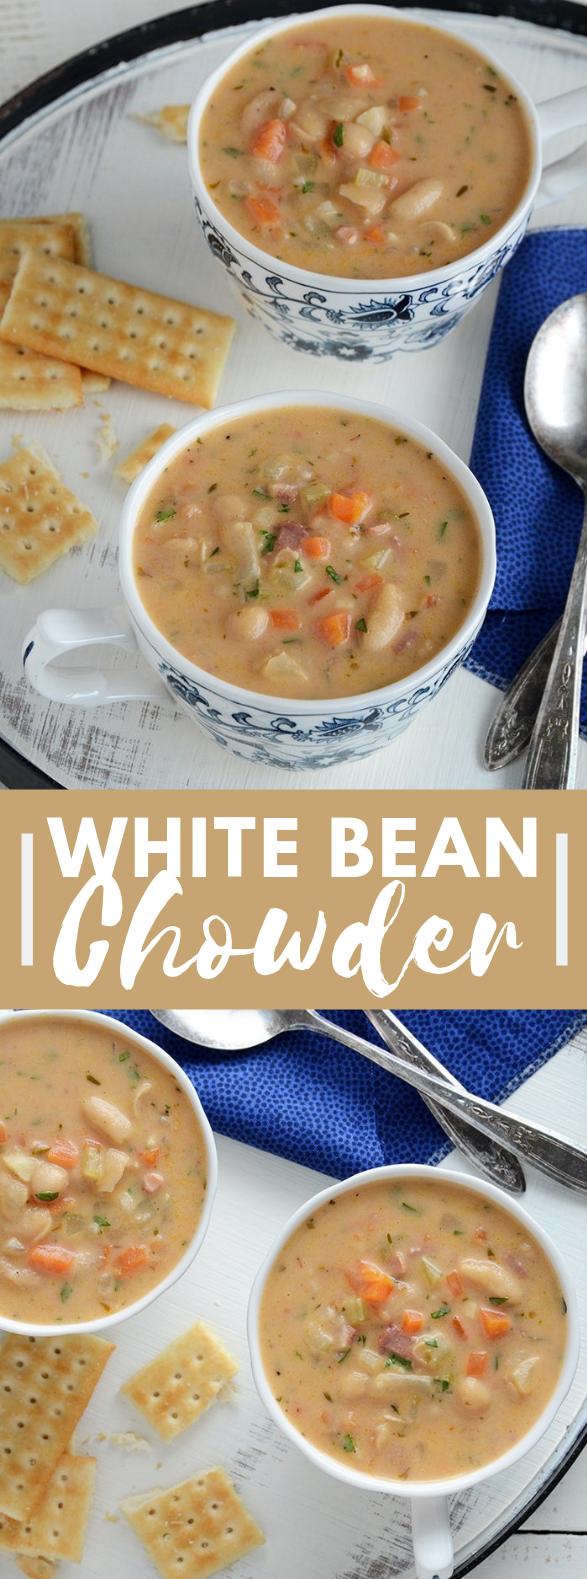 White Bean Chowder #vegetarian #soup